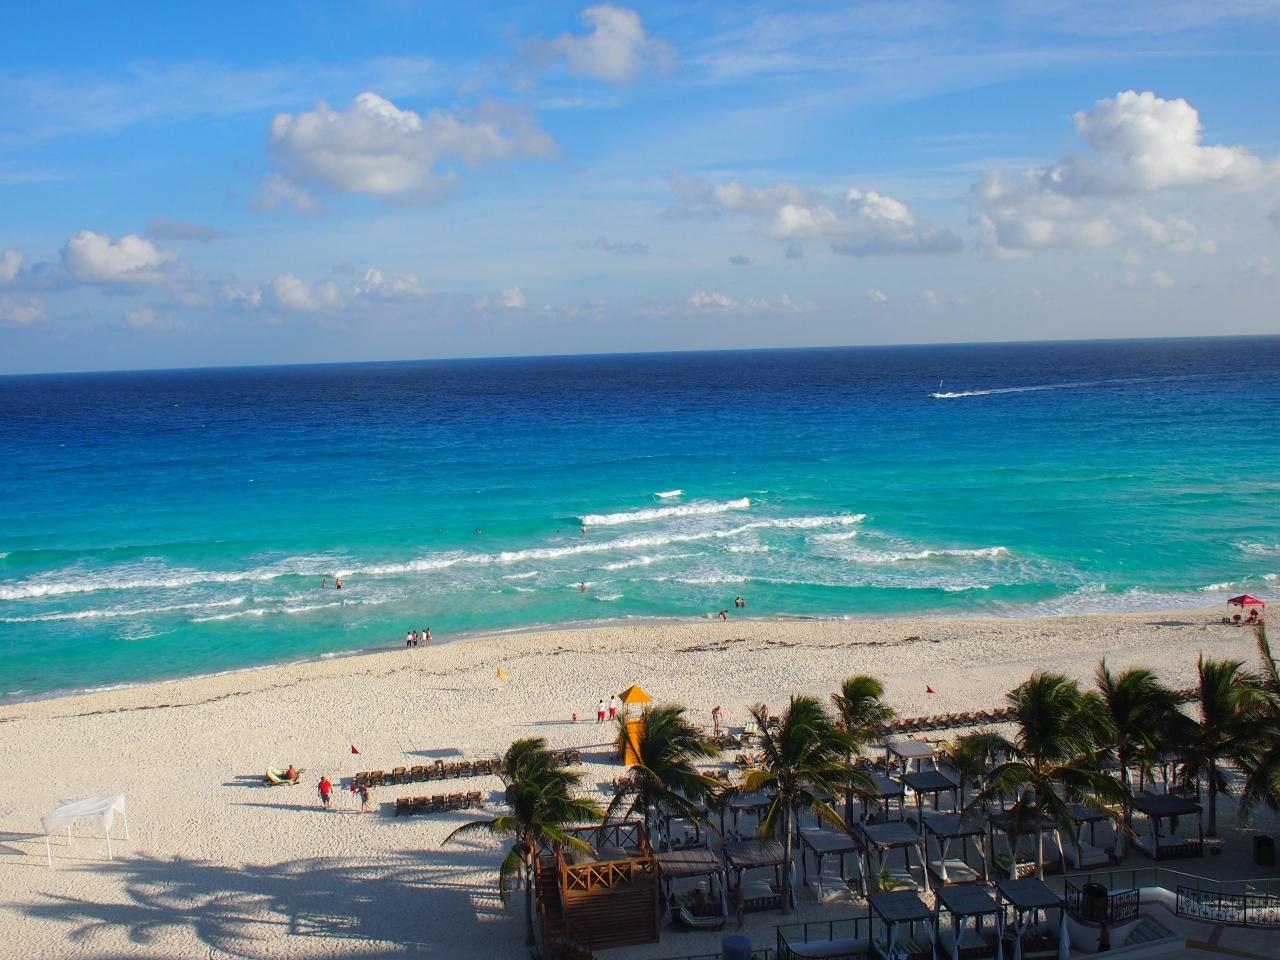 cancún&wdw *episode1*』カンクン(メキシコ)の旅行記・ブログ by k_tonny